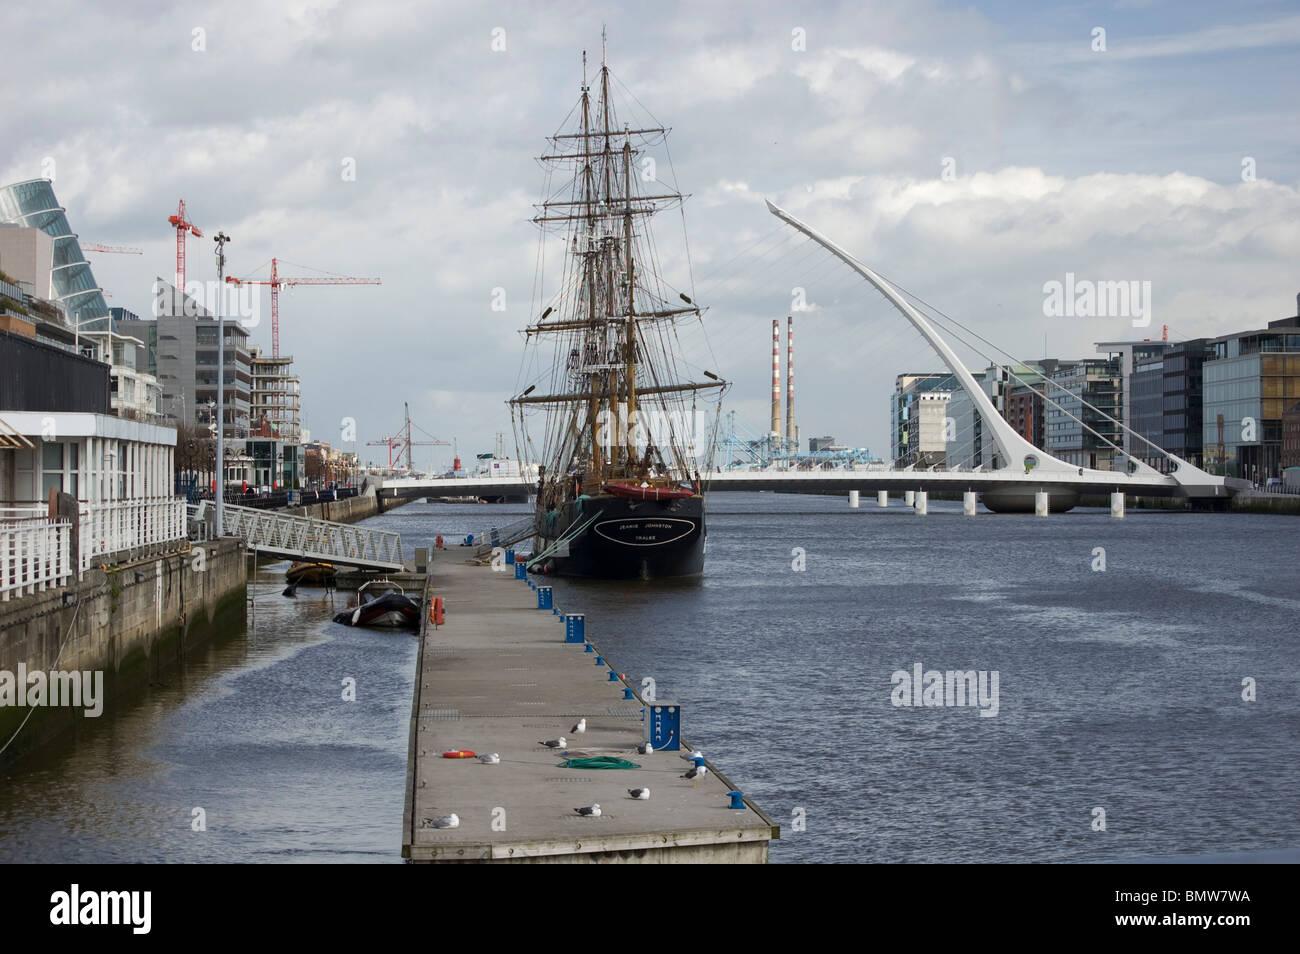 Tall ship, Docklands, Dublin - Stock Image